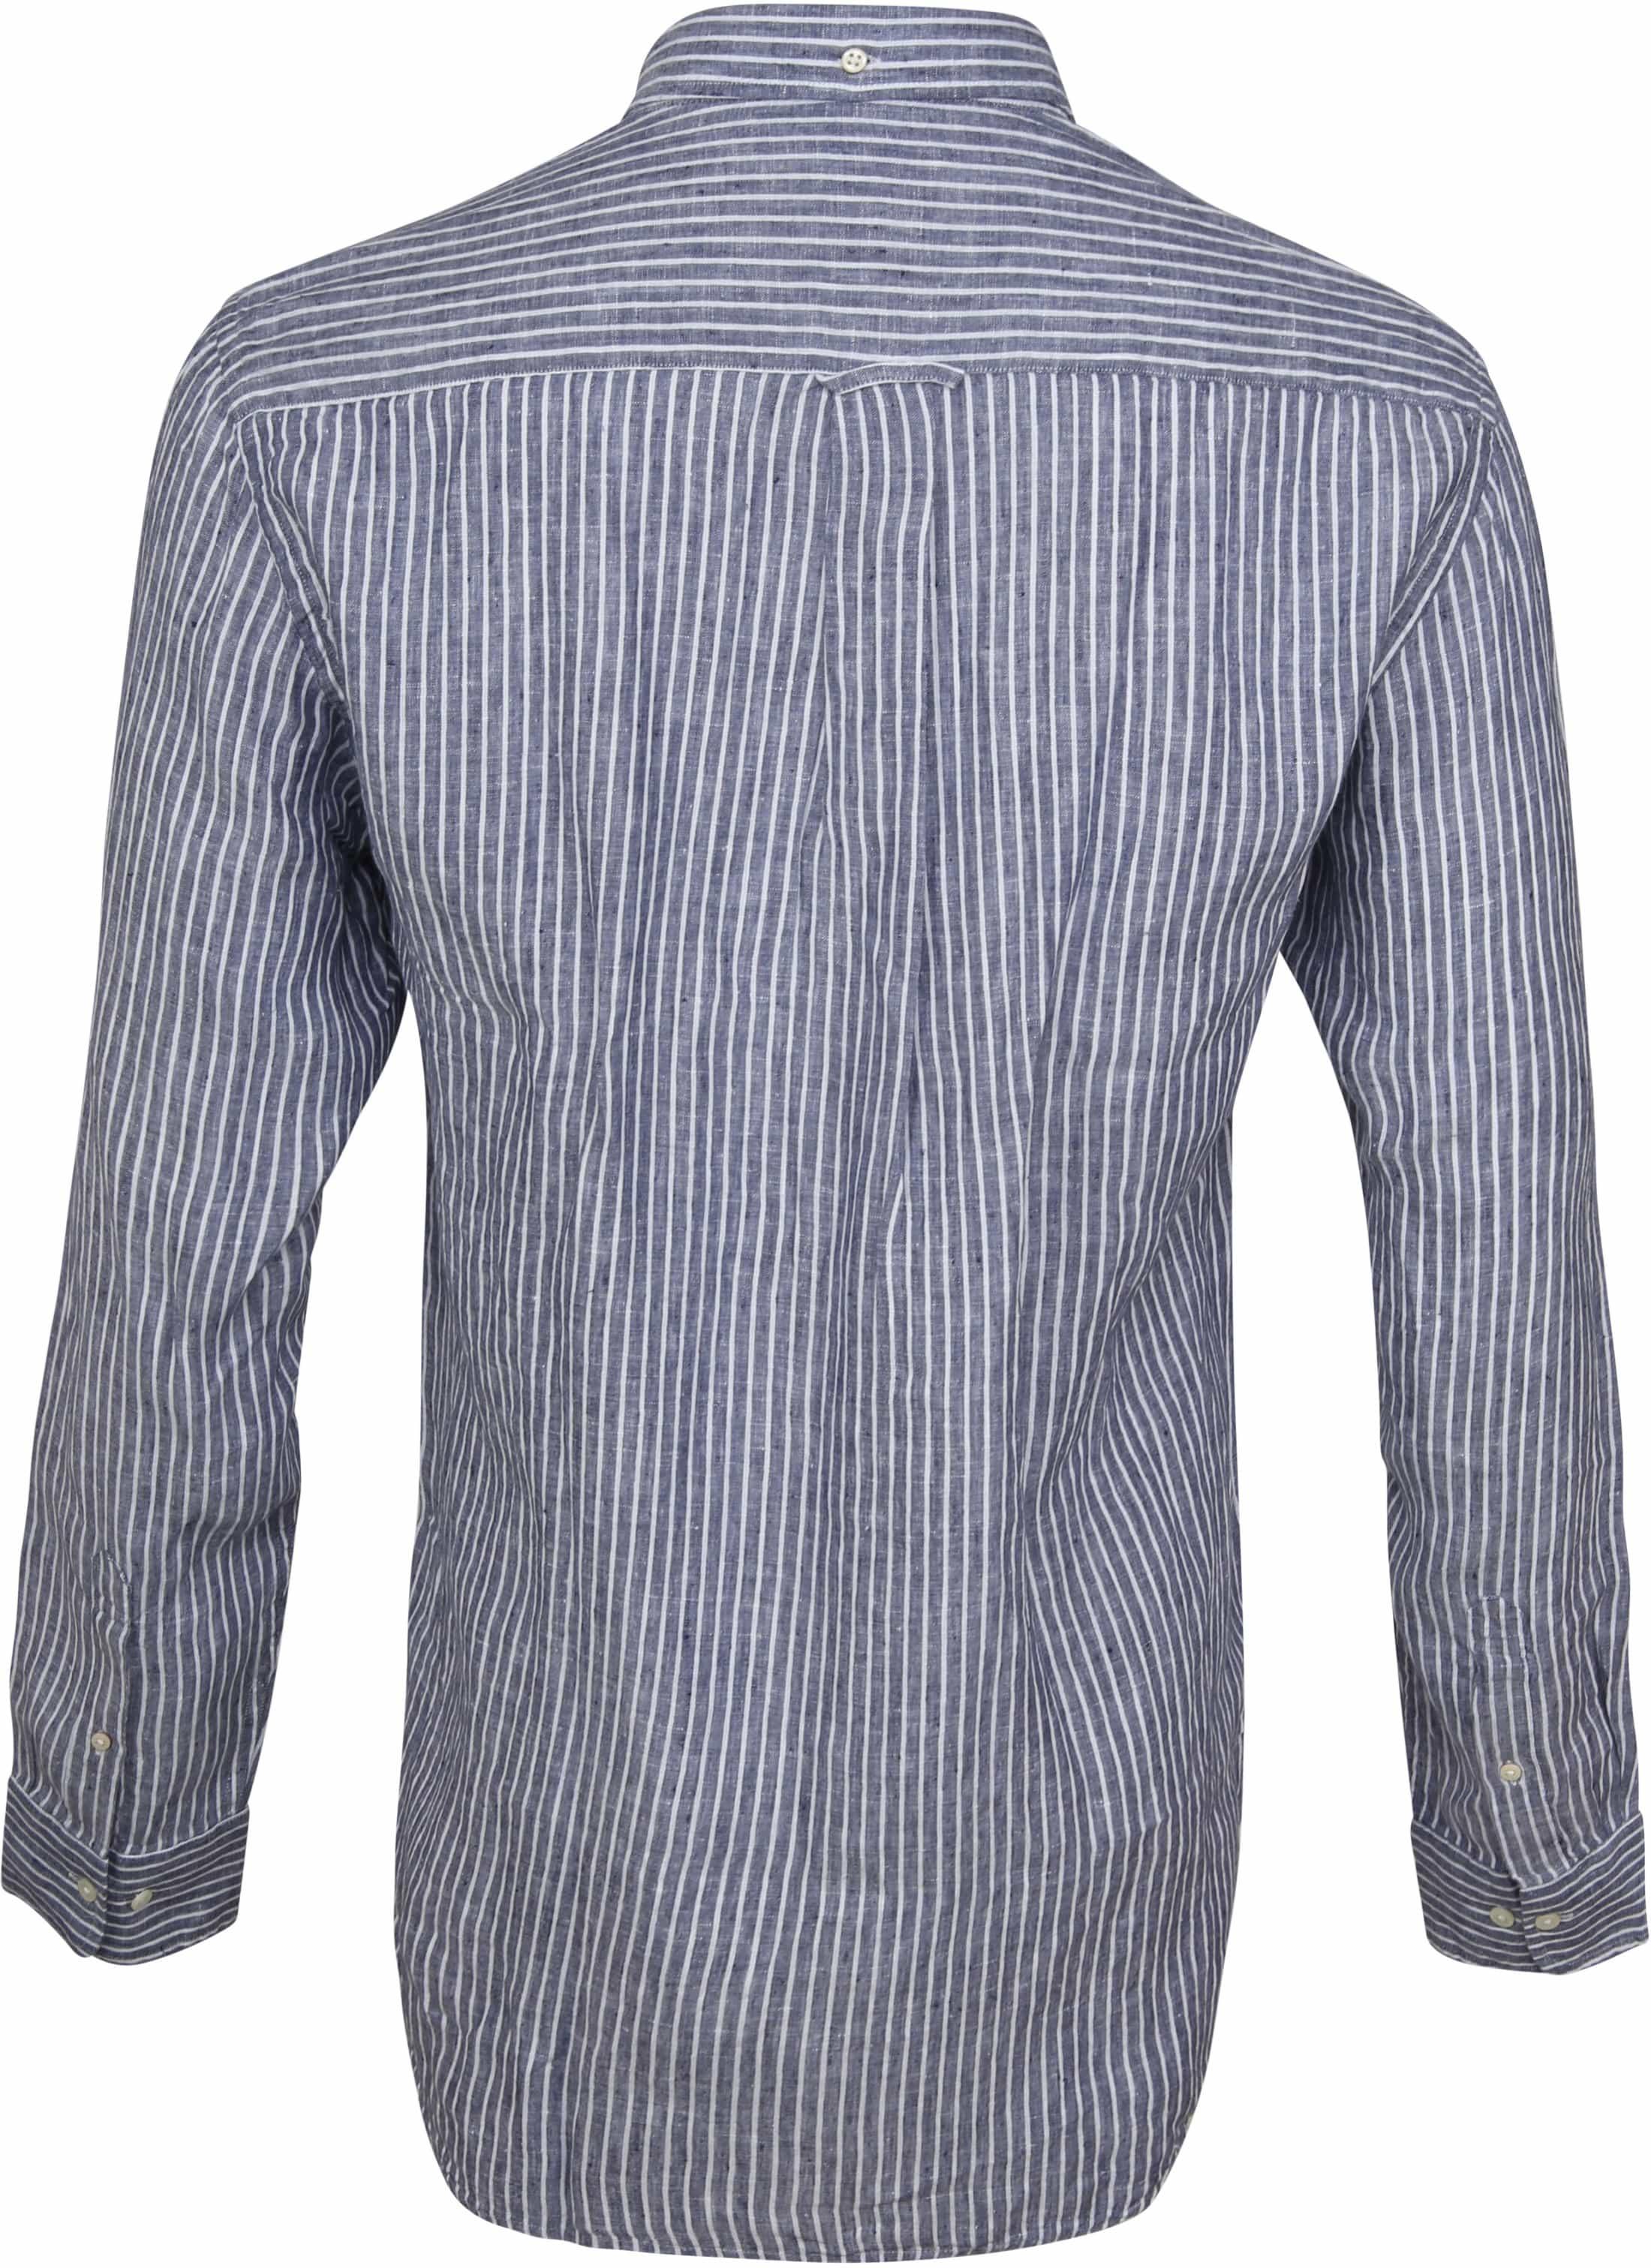 Gant Casual Overhemd Linnen Blauw foto 3